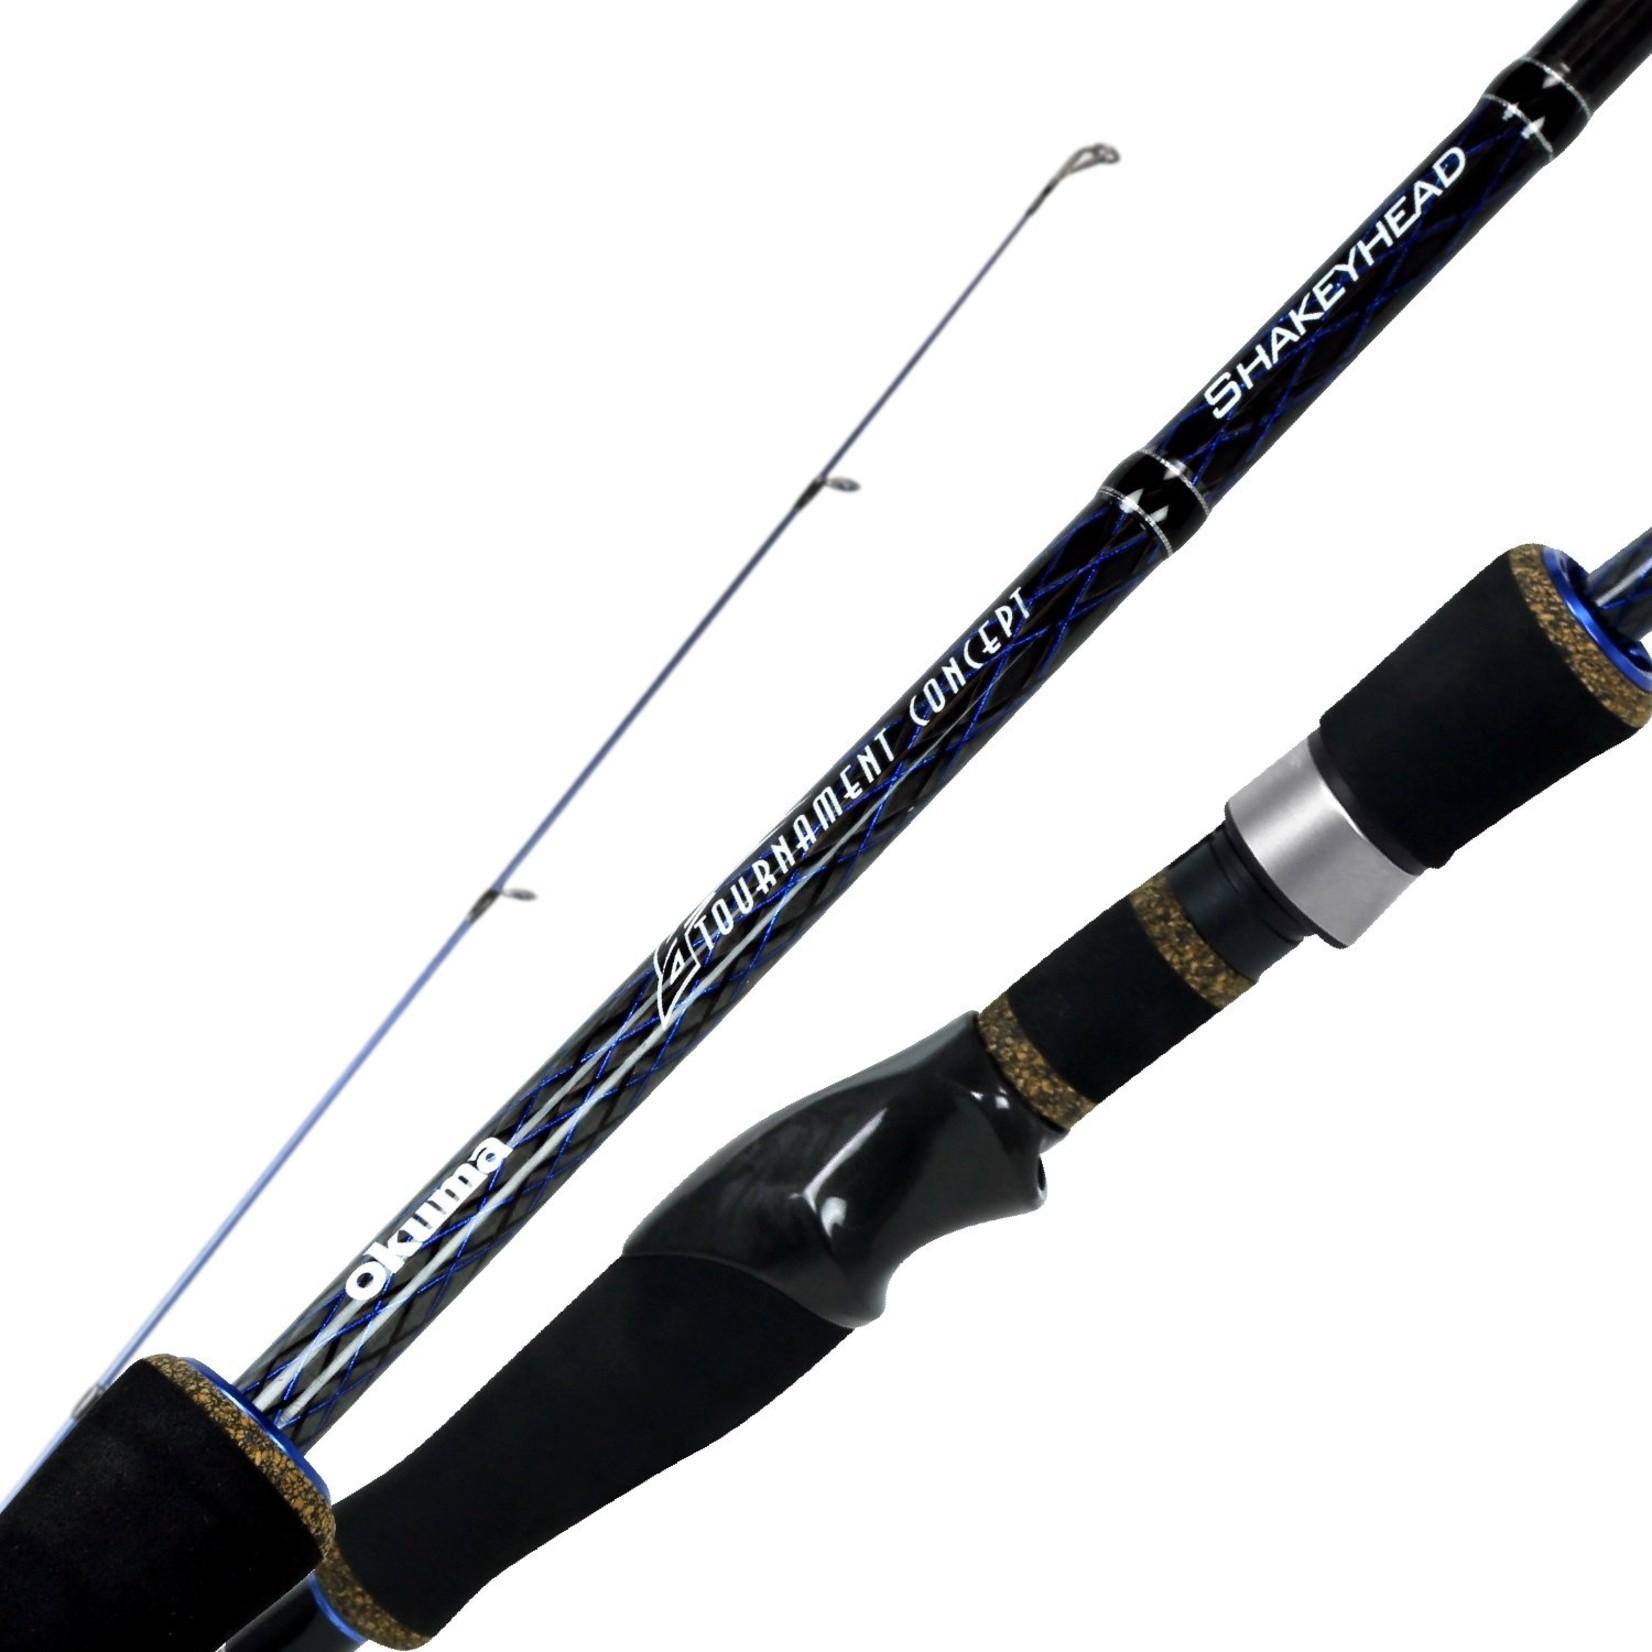 Okuma Fishing Tackle Okuma Tournament Concept 7'2'' Mla